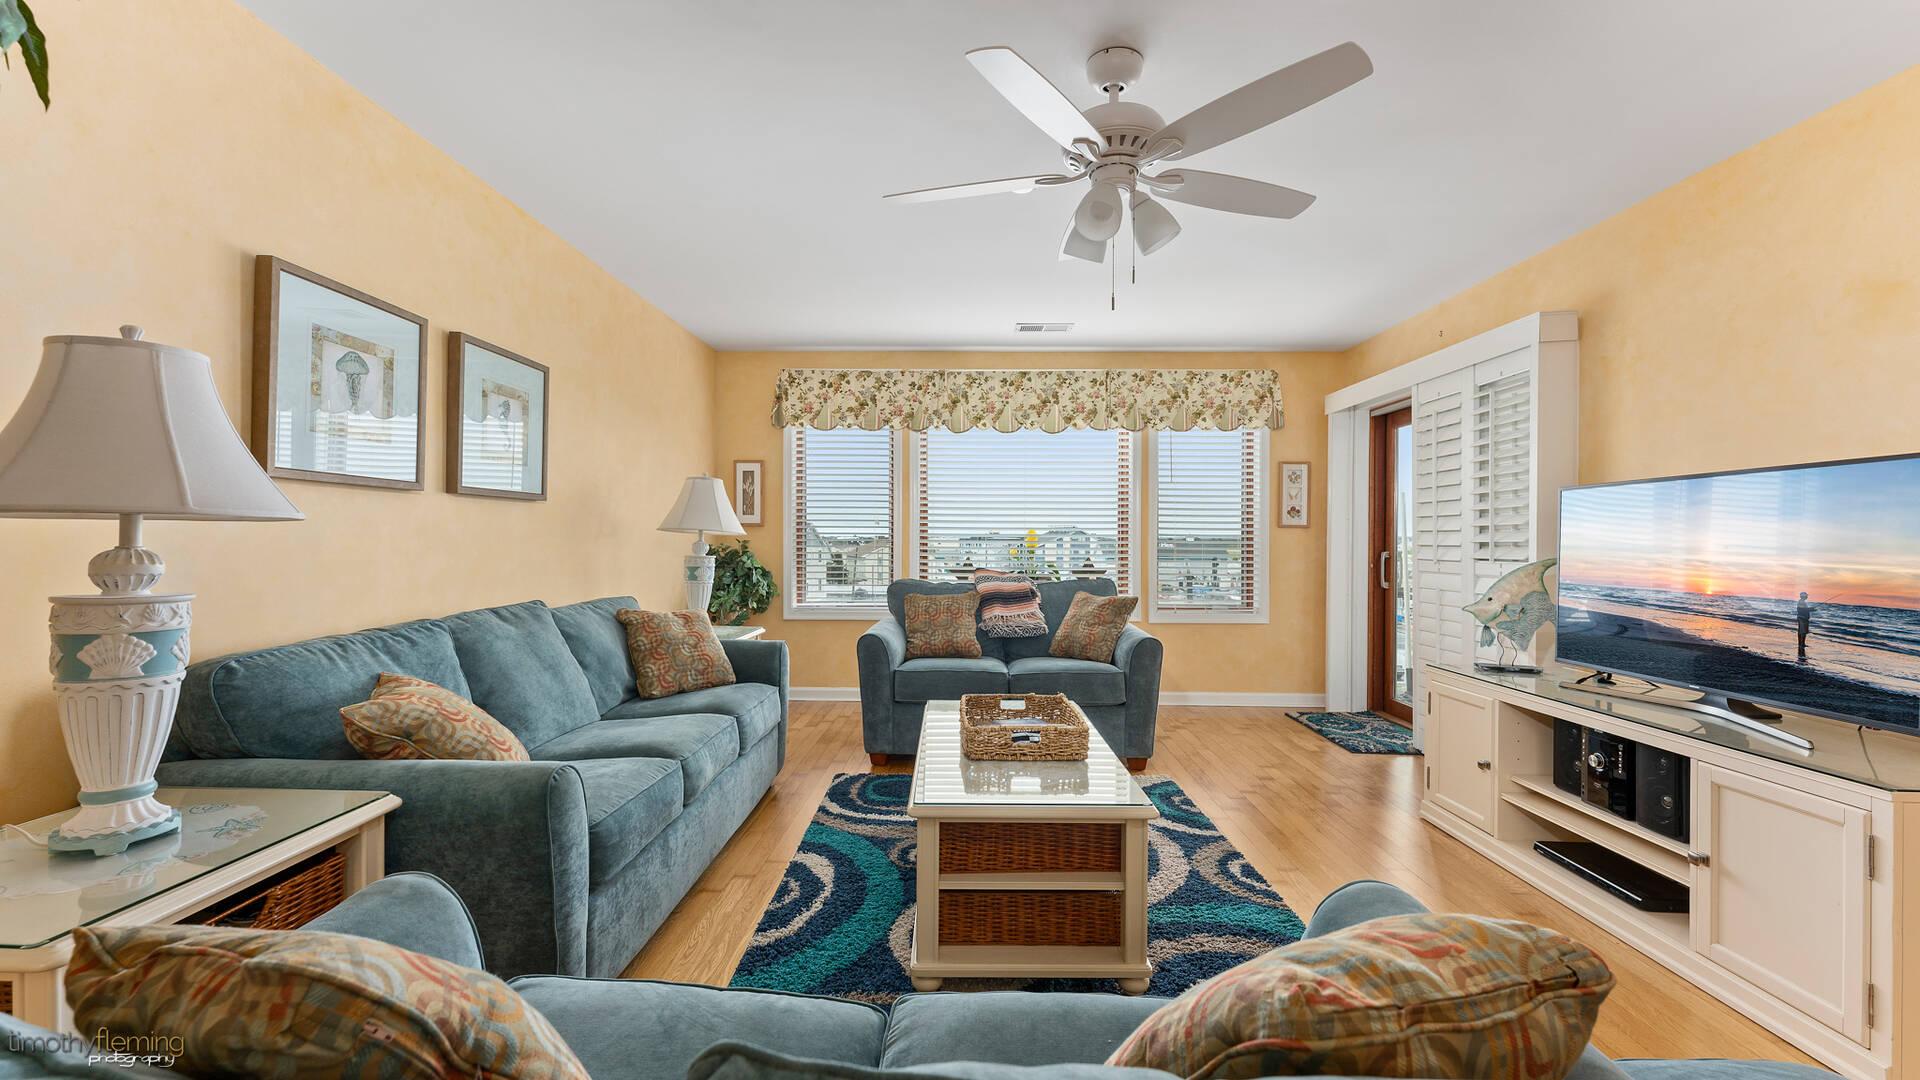 4901 Susquehanna Ave #305 Wildwood, NJ 08260